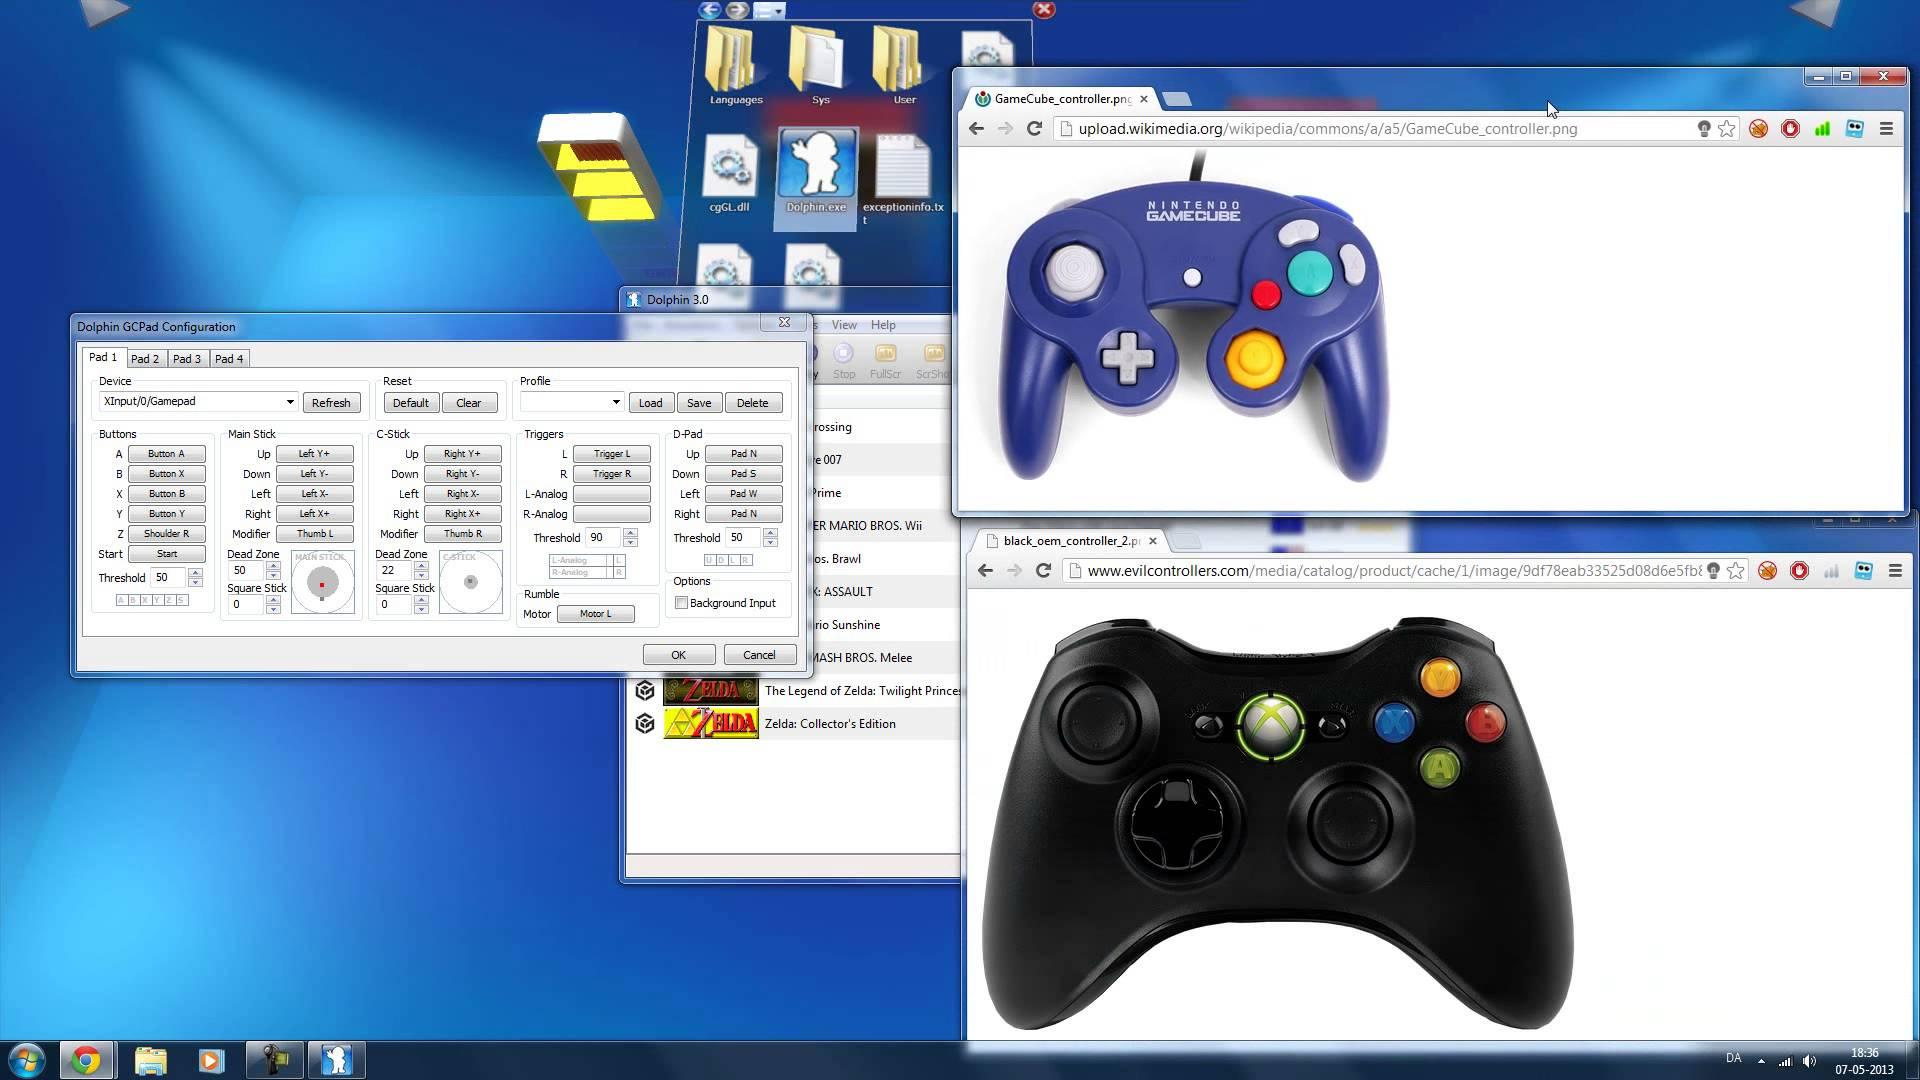 dolphin emulator ps3 controller settings